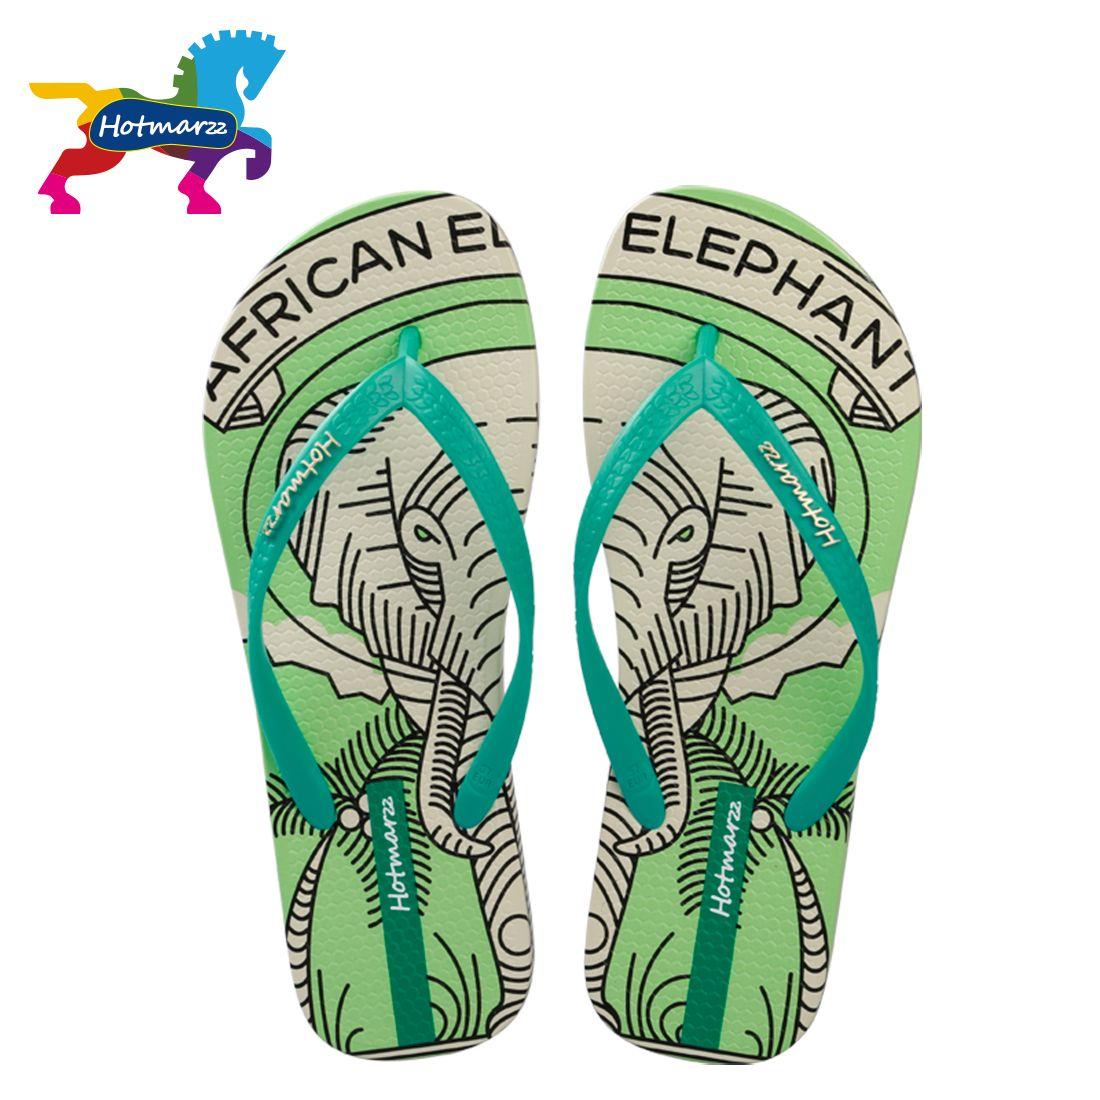 Couple Flip Flops Horse Sand Print Chic Sandals Slipper Rubber Non-Slip Spa Thong Slippers